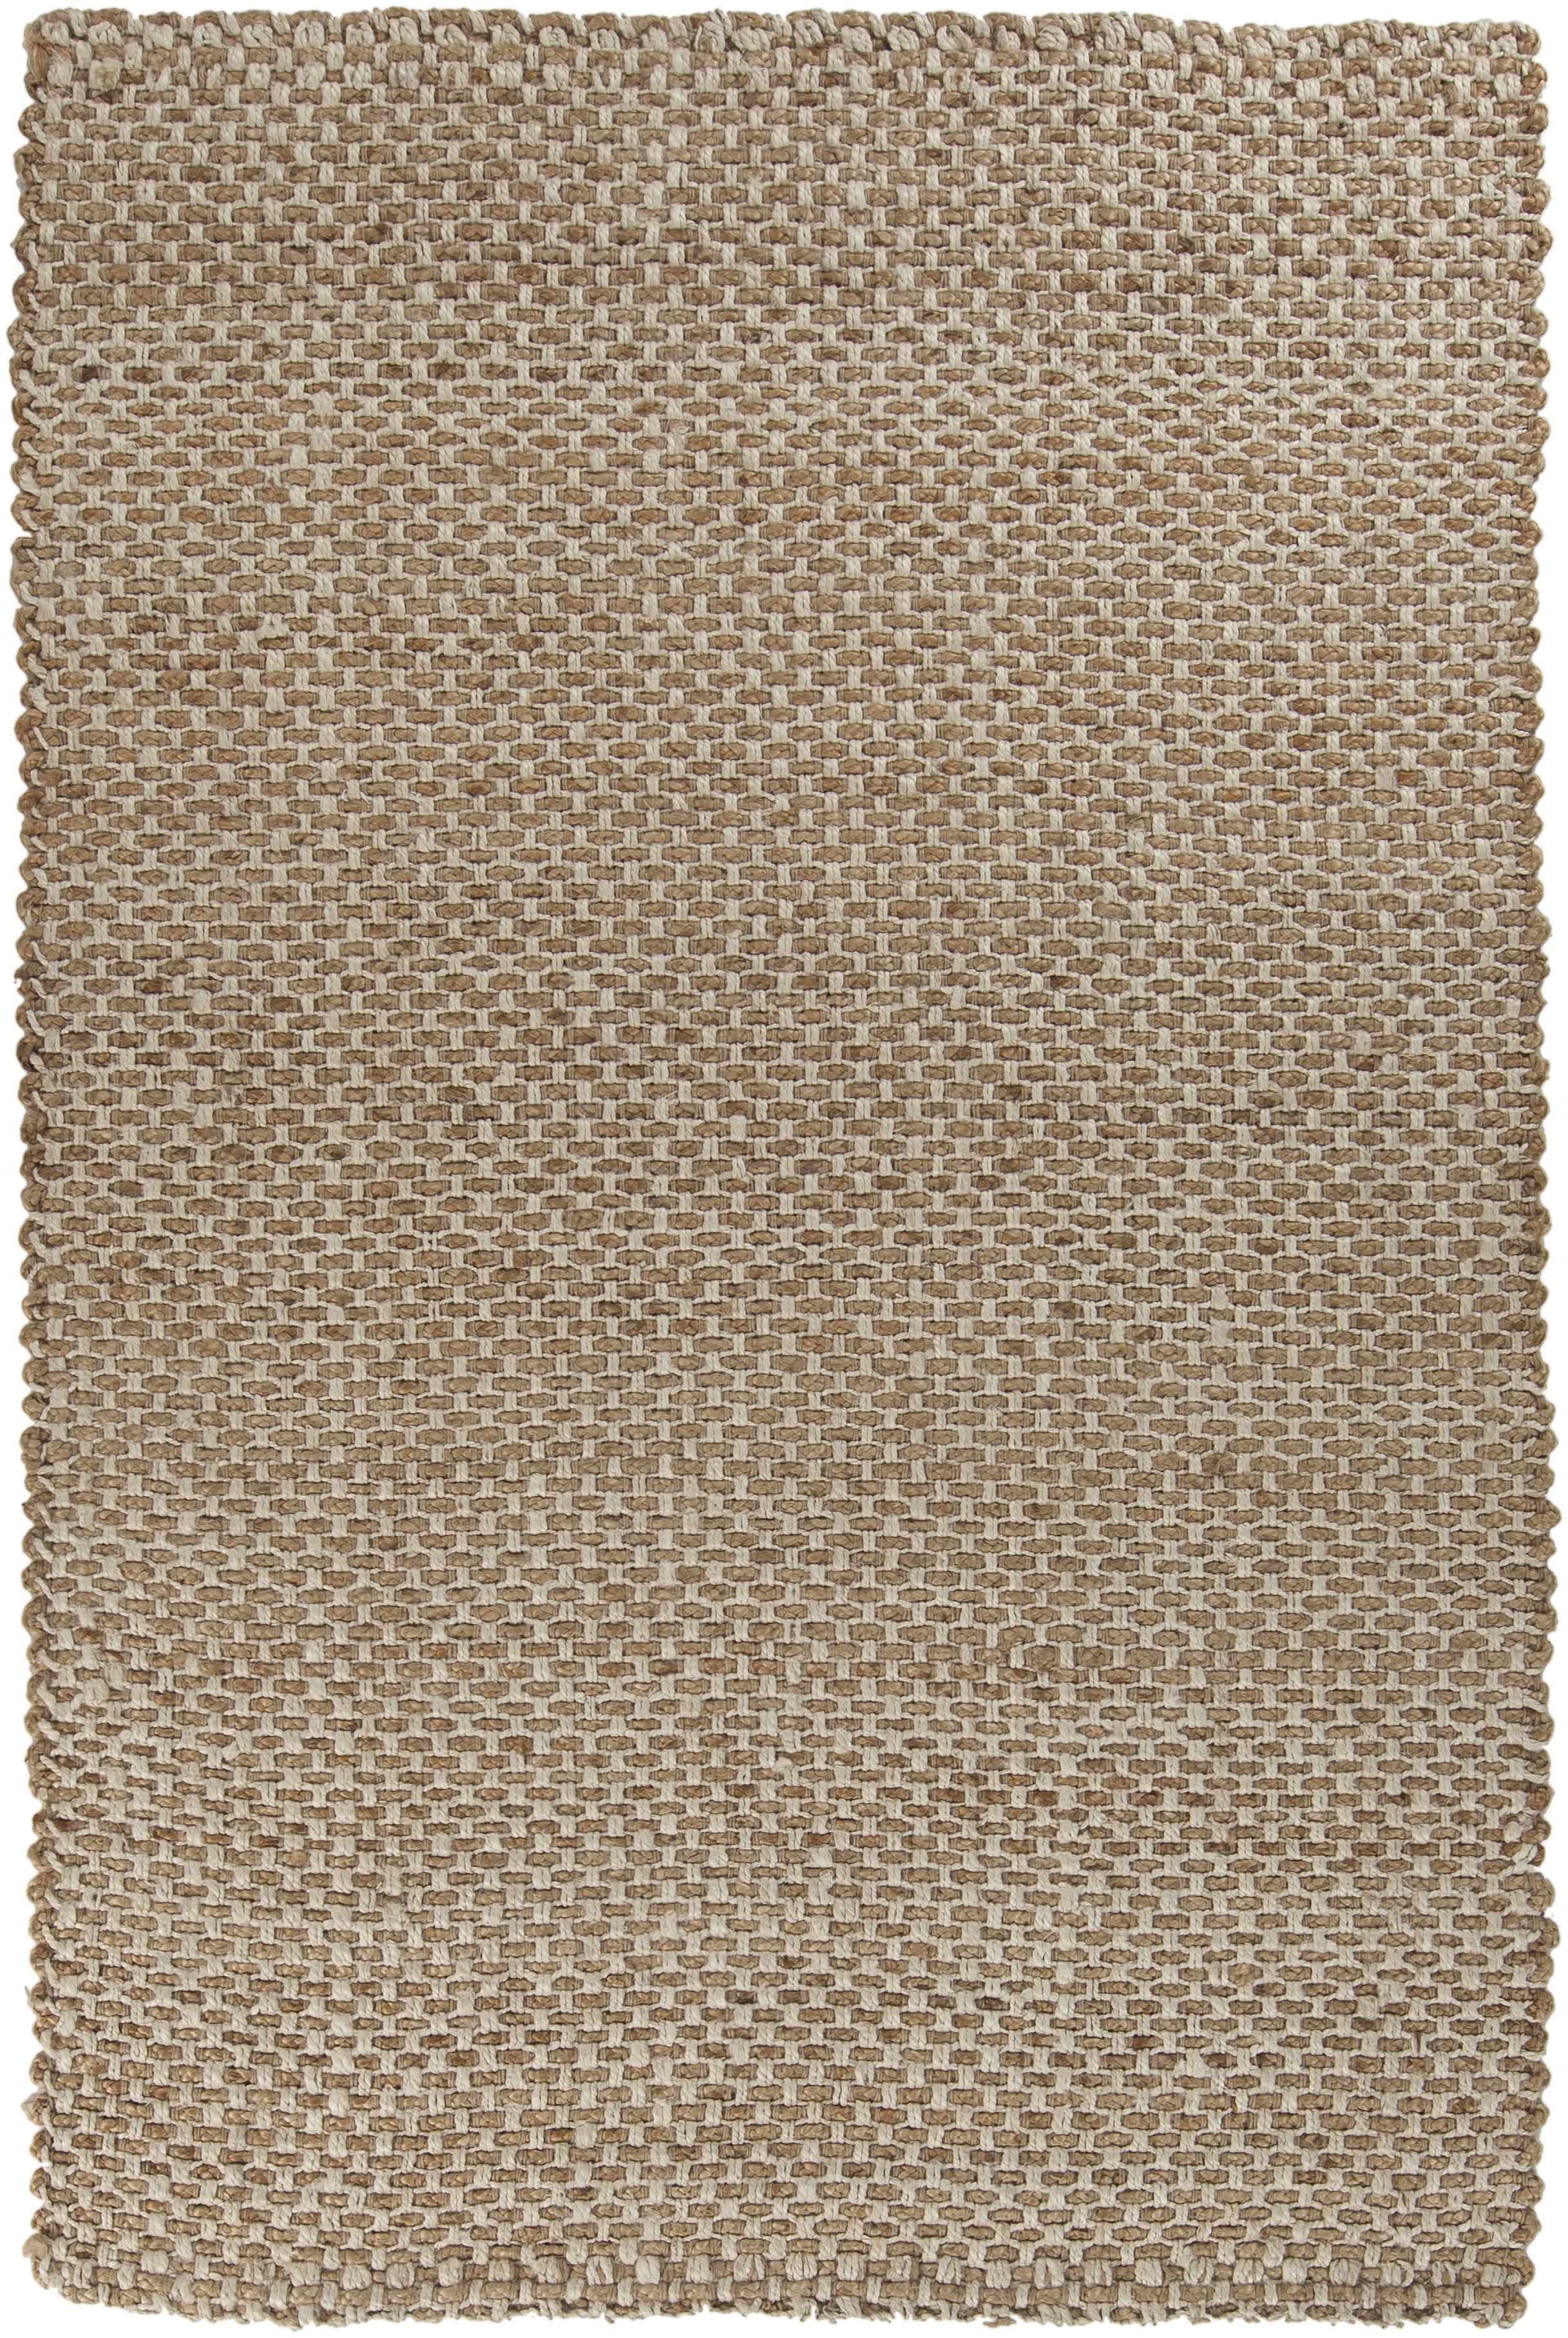 Surya Reeds 2' x 3' - Item Number: REED824-23